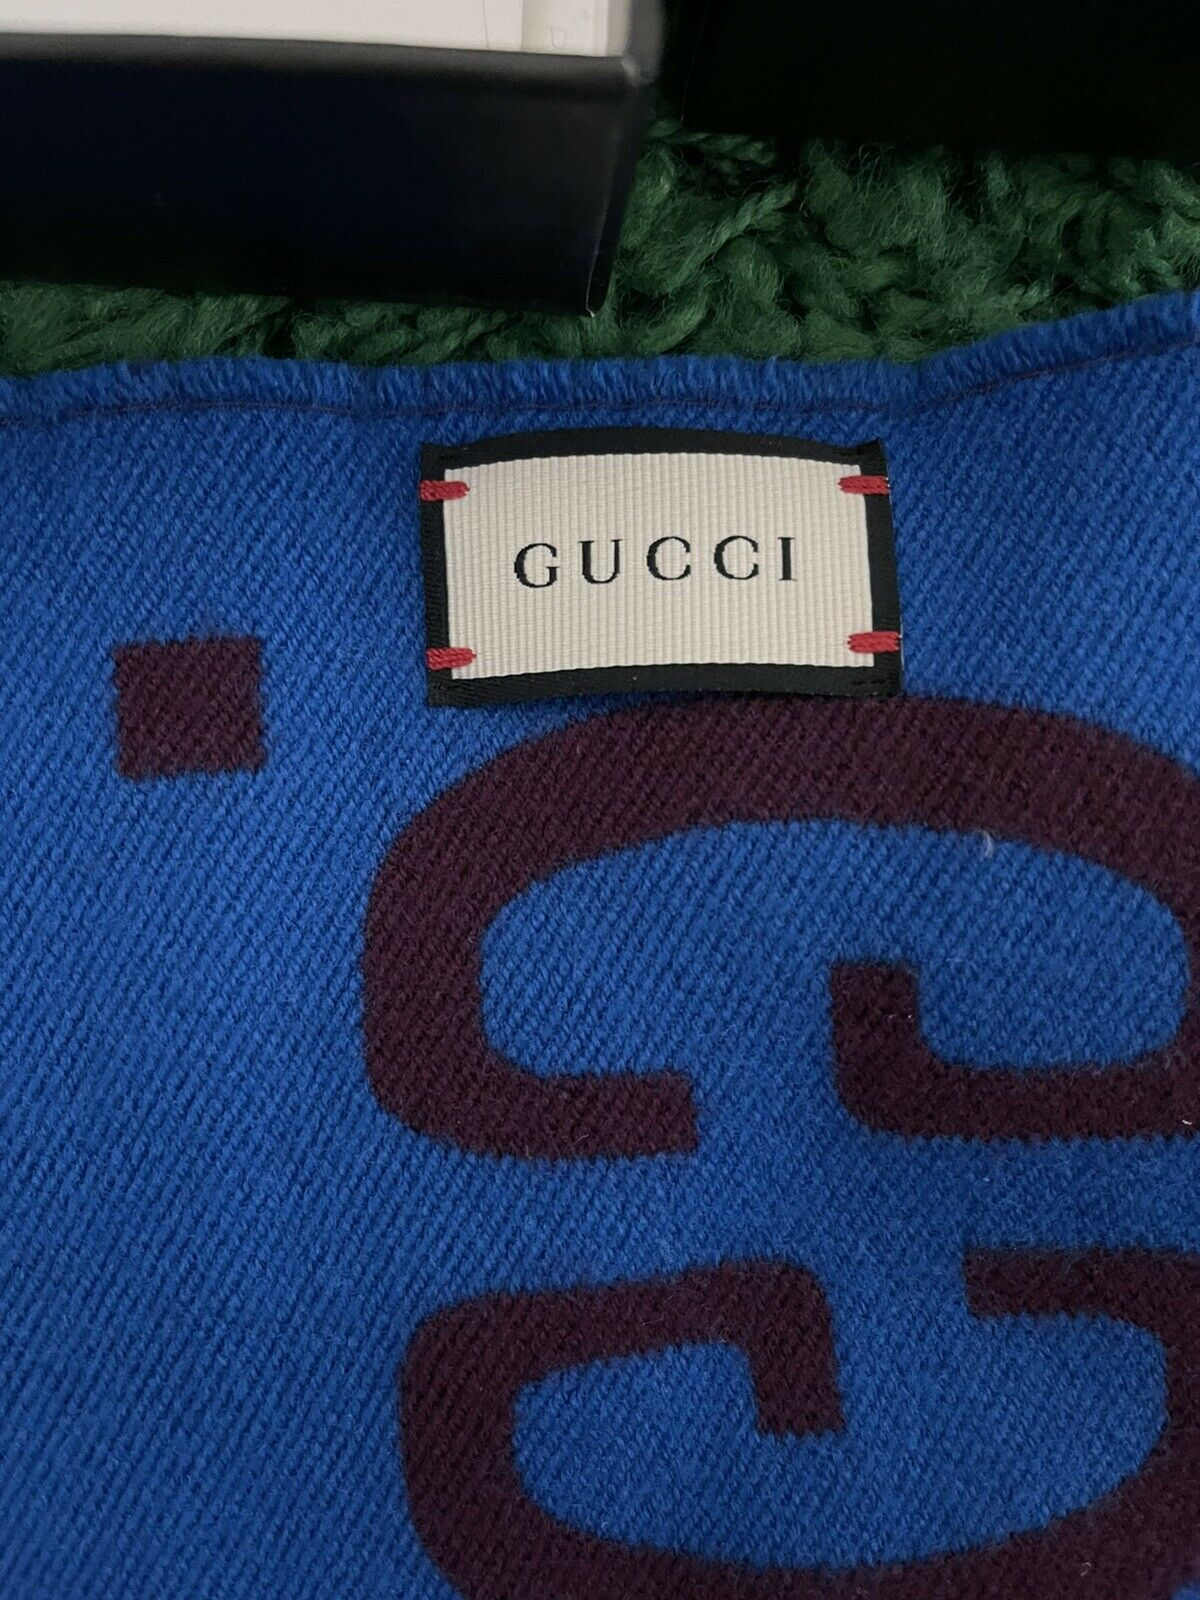 Gucci GG jacquard wool silk scarf - image 2